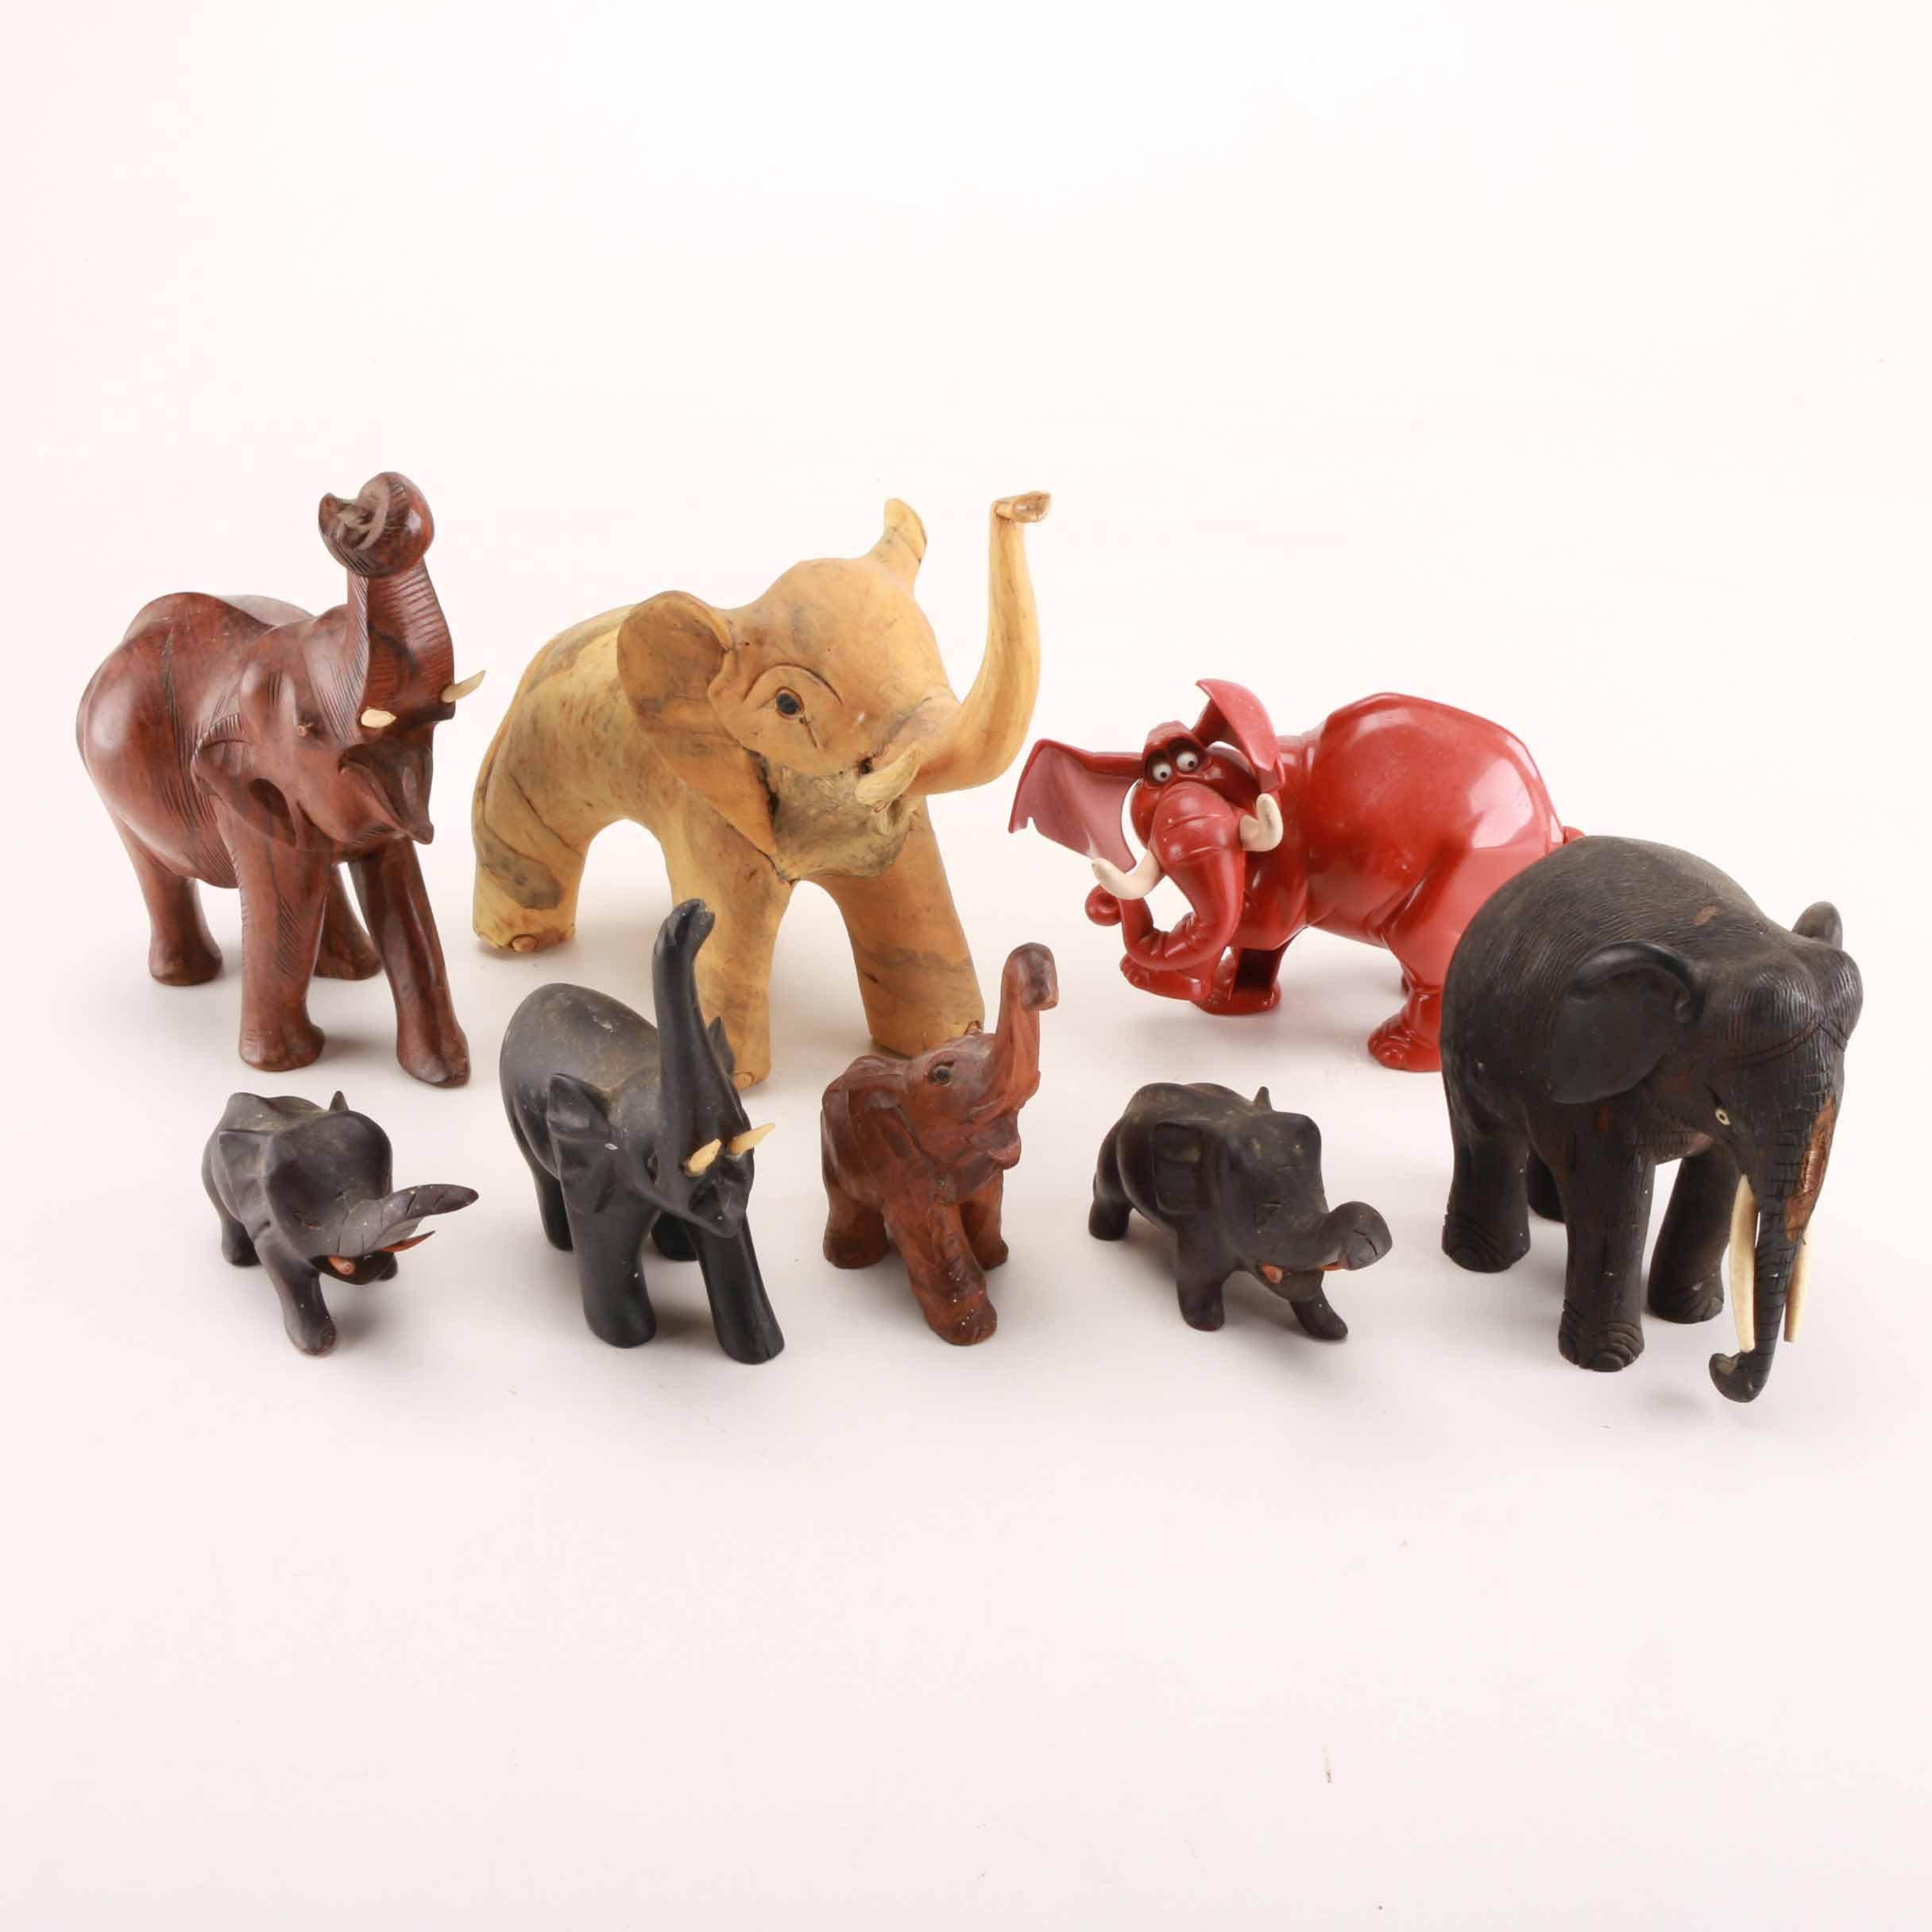 Variety of Elephant Figurines